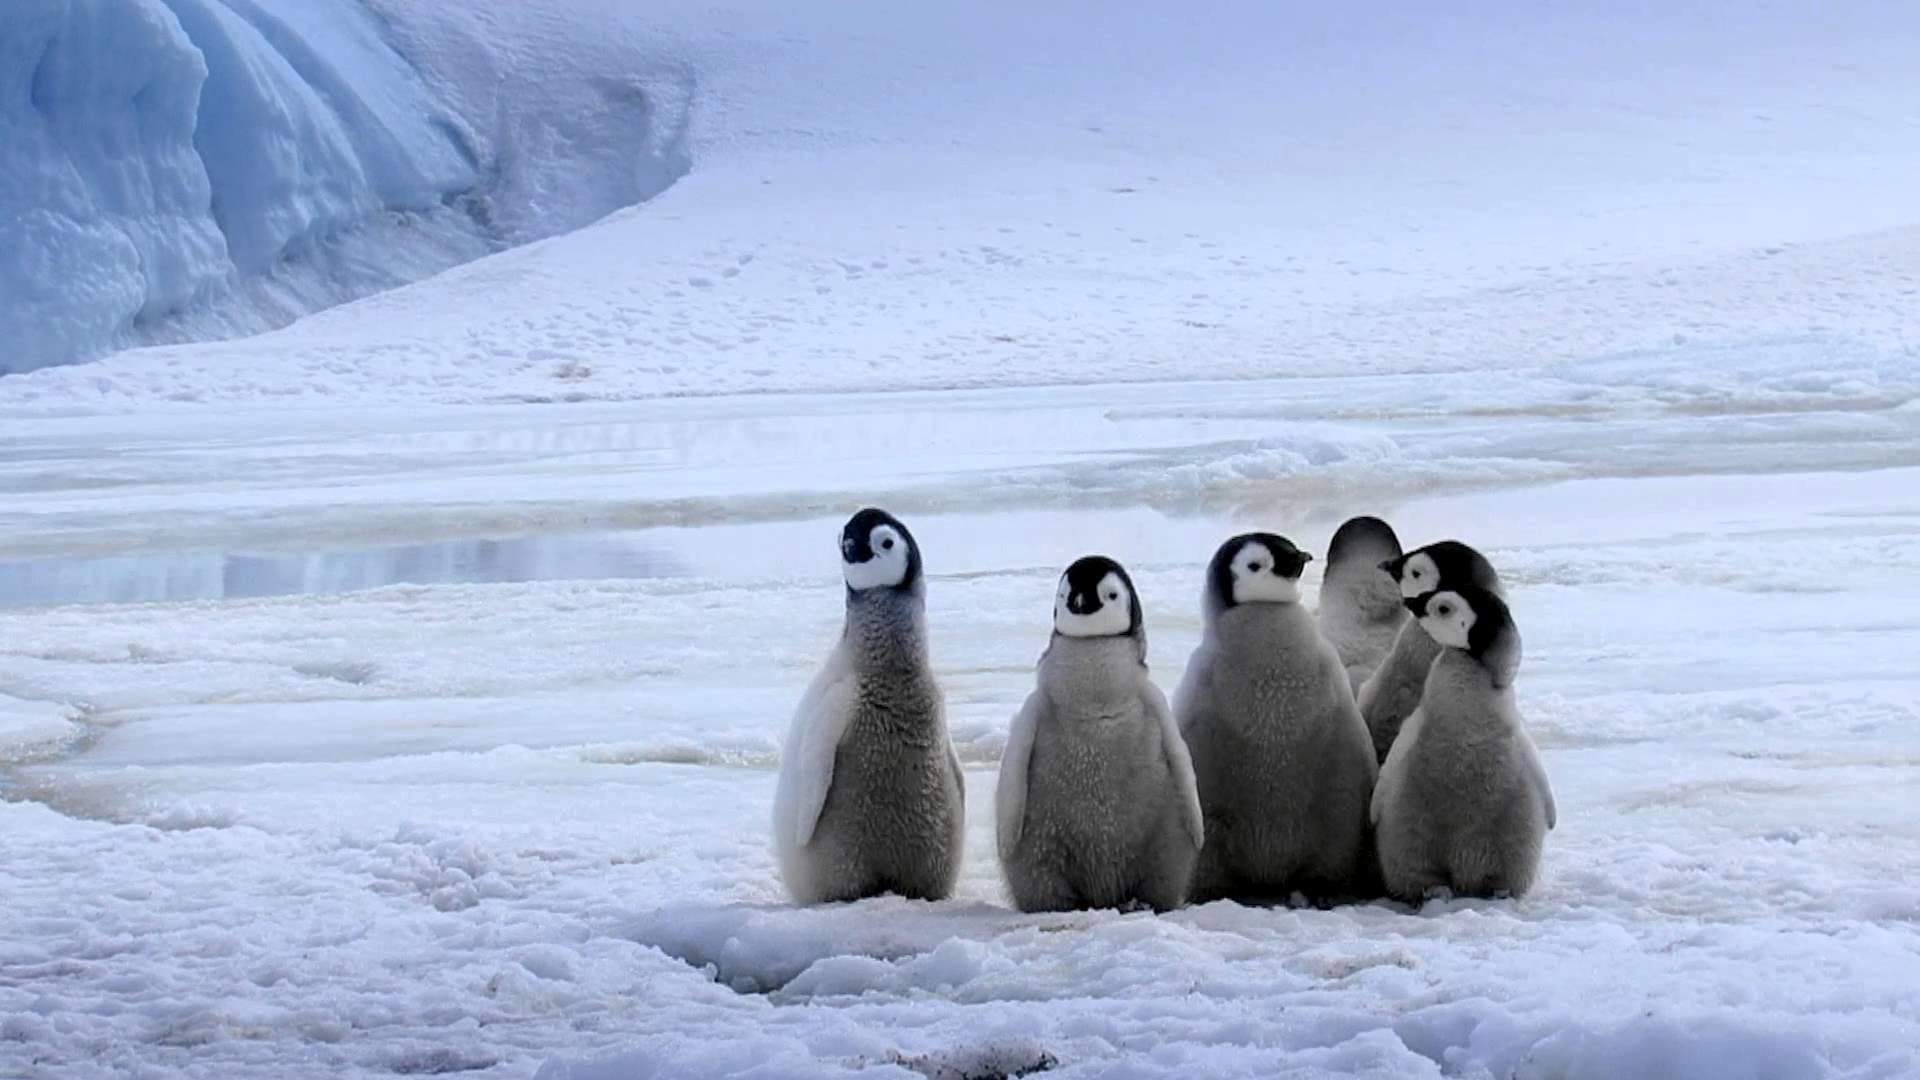 penguin wallpaper 60 pictures